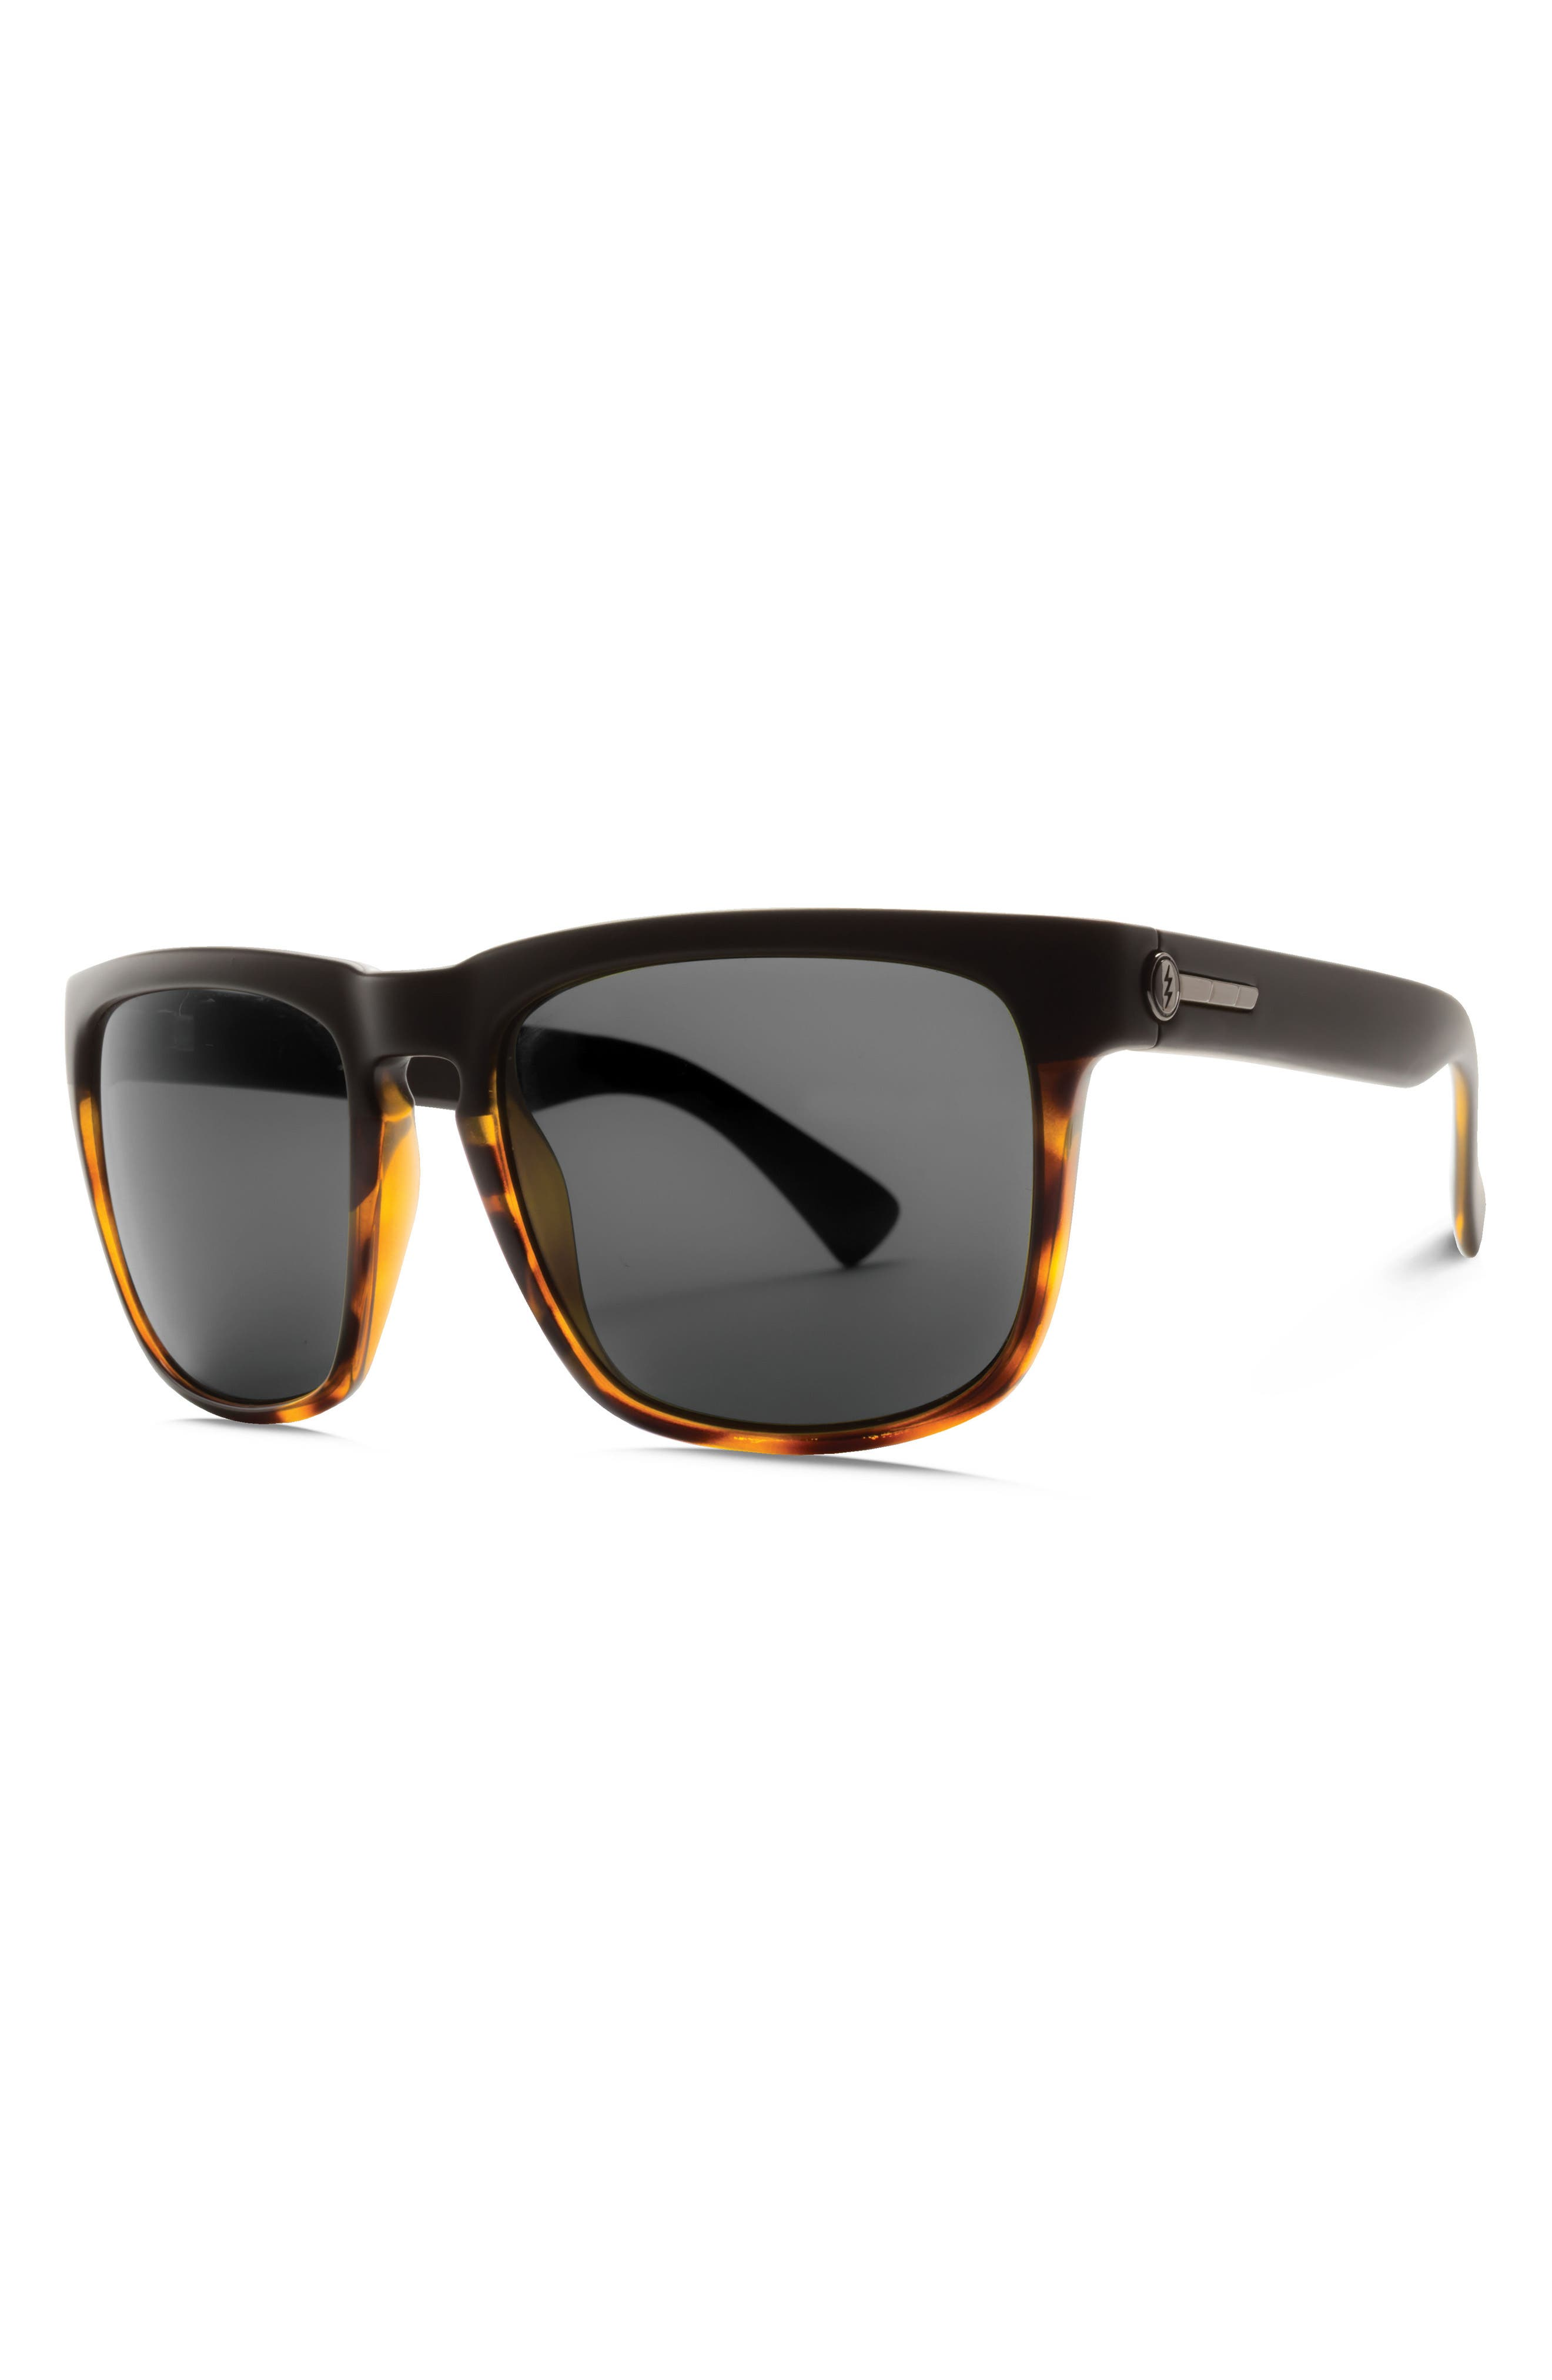 Knoxville XL 61mm Sunglasses,                             Alternate thumbnail 2, color,                             200